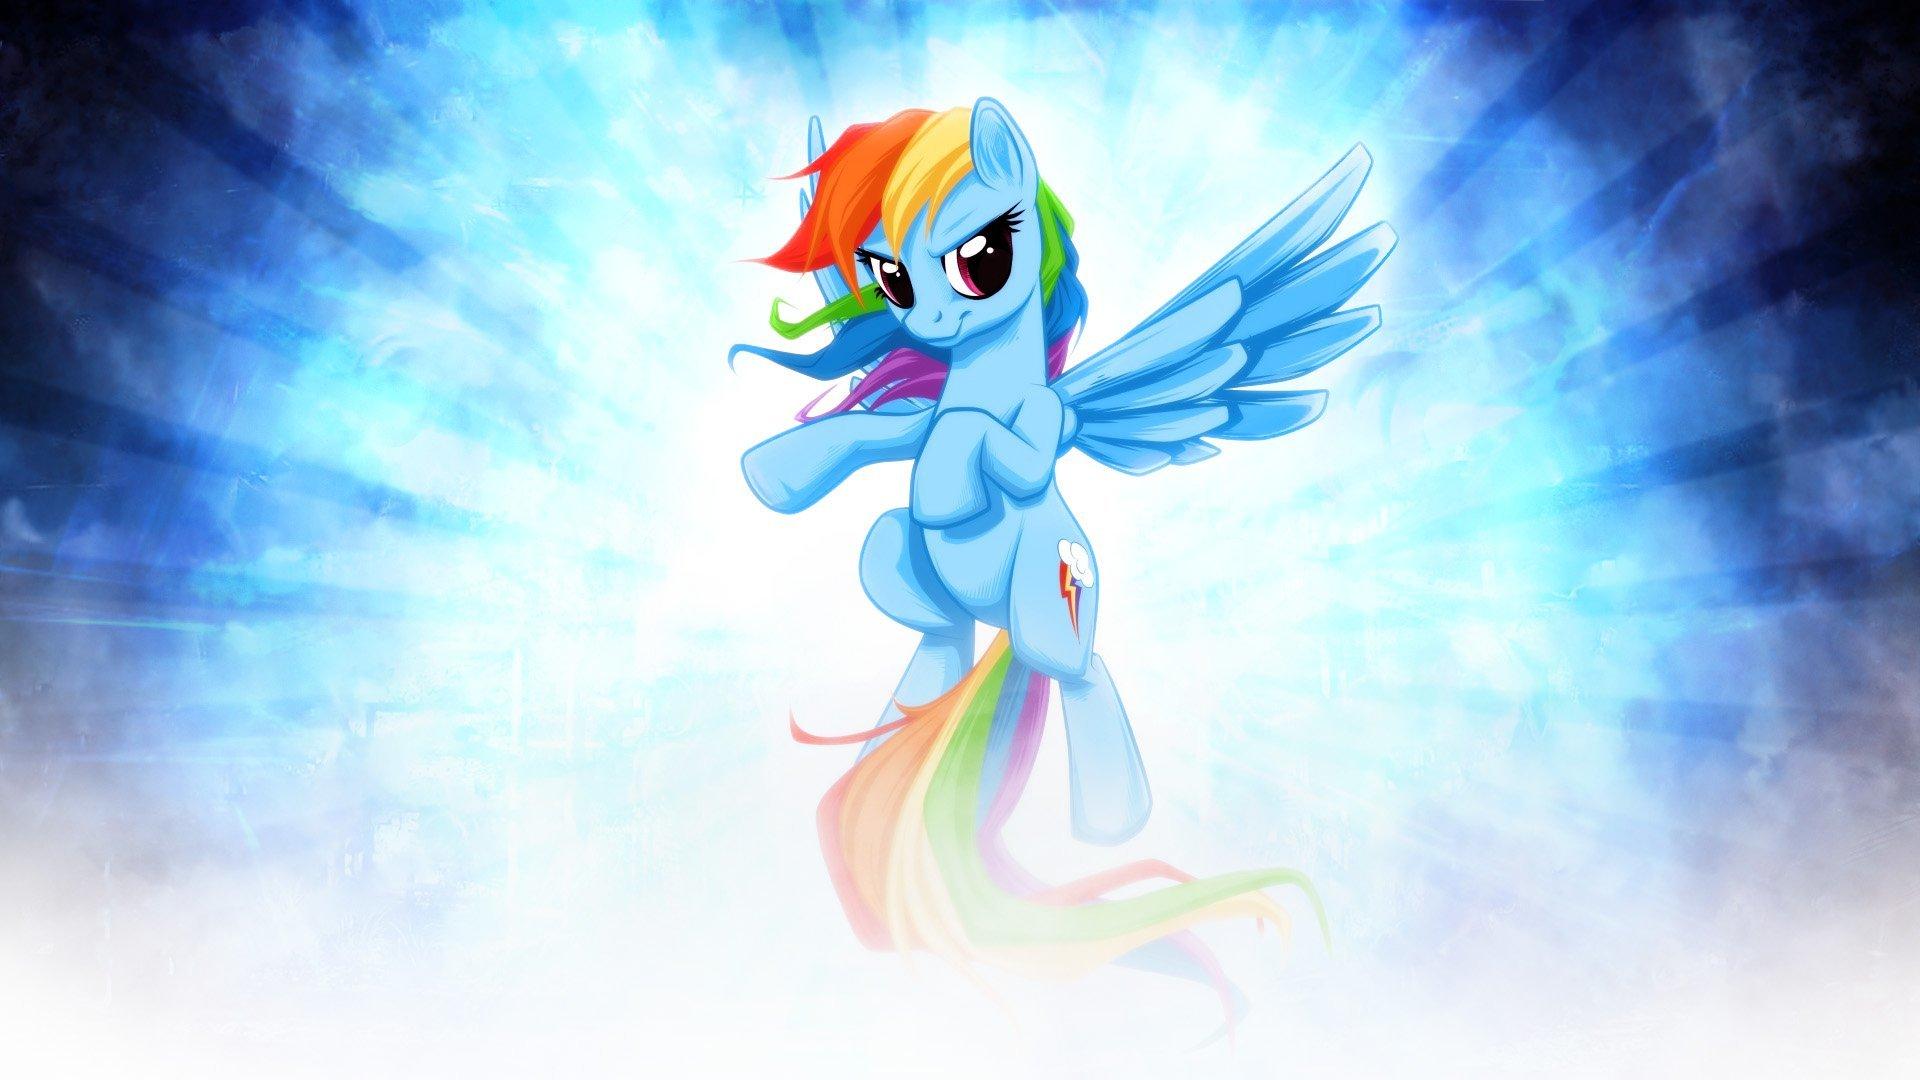 Best Rainbow Dash wallpaper ID:154376 for High Resolution full hd 1080p computer